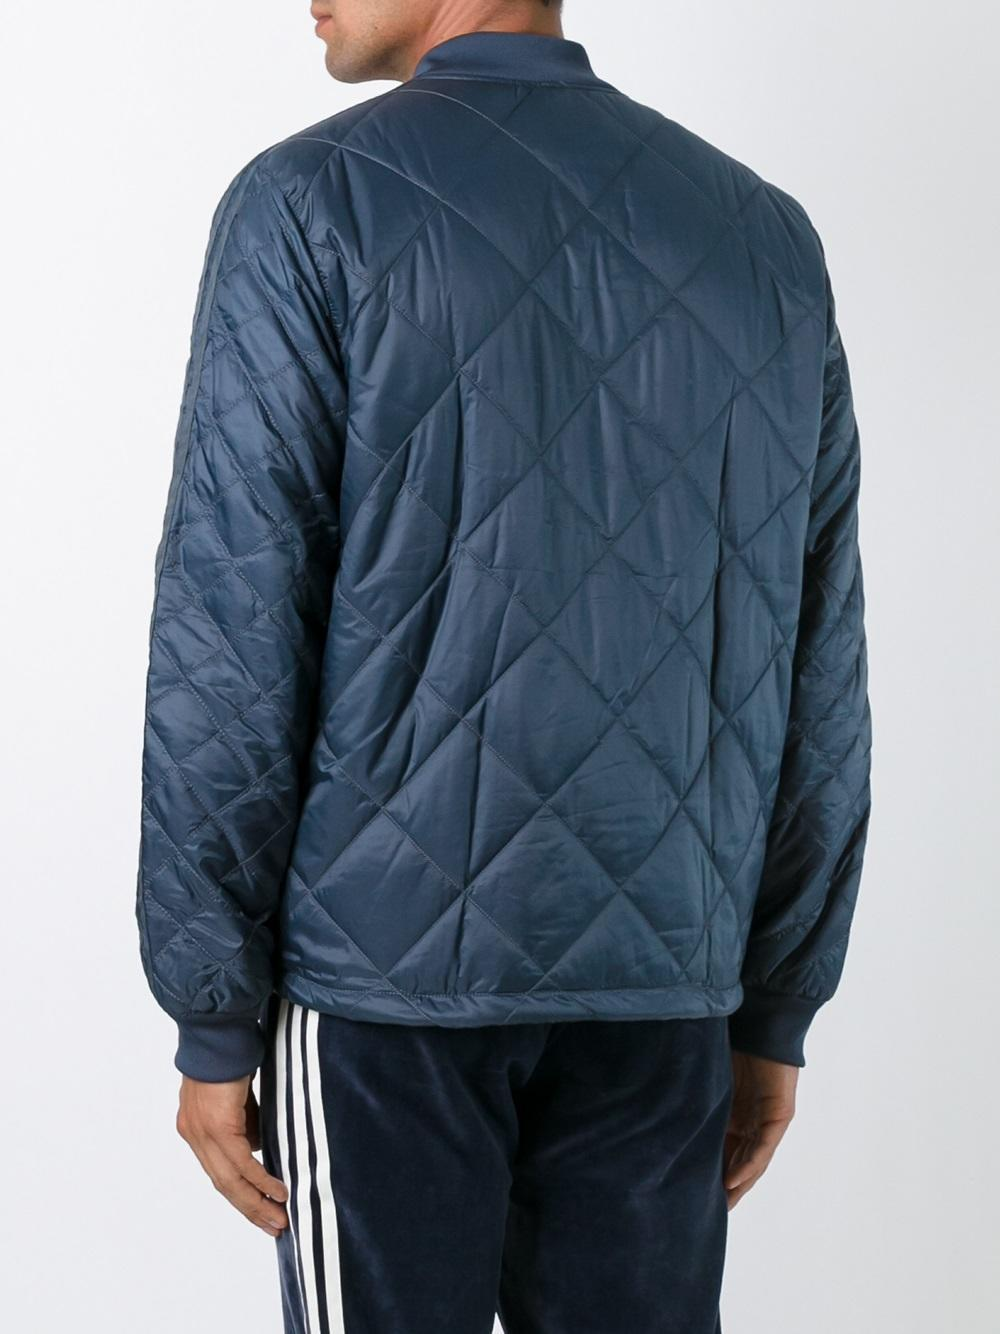 Adidas Originals Quilted Superstar Bomber Jacket In Blue